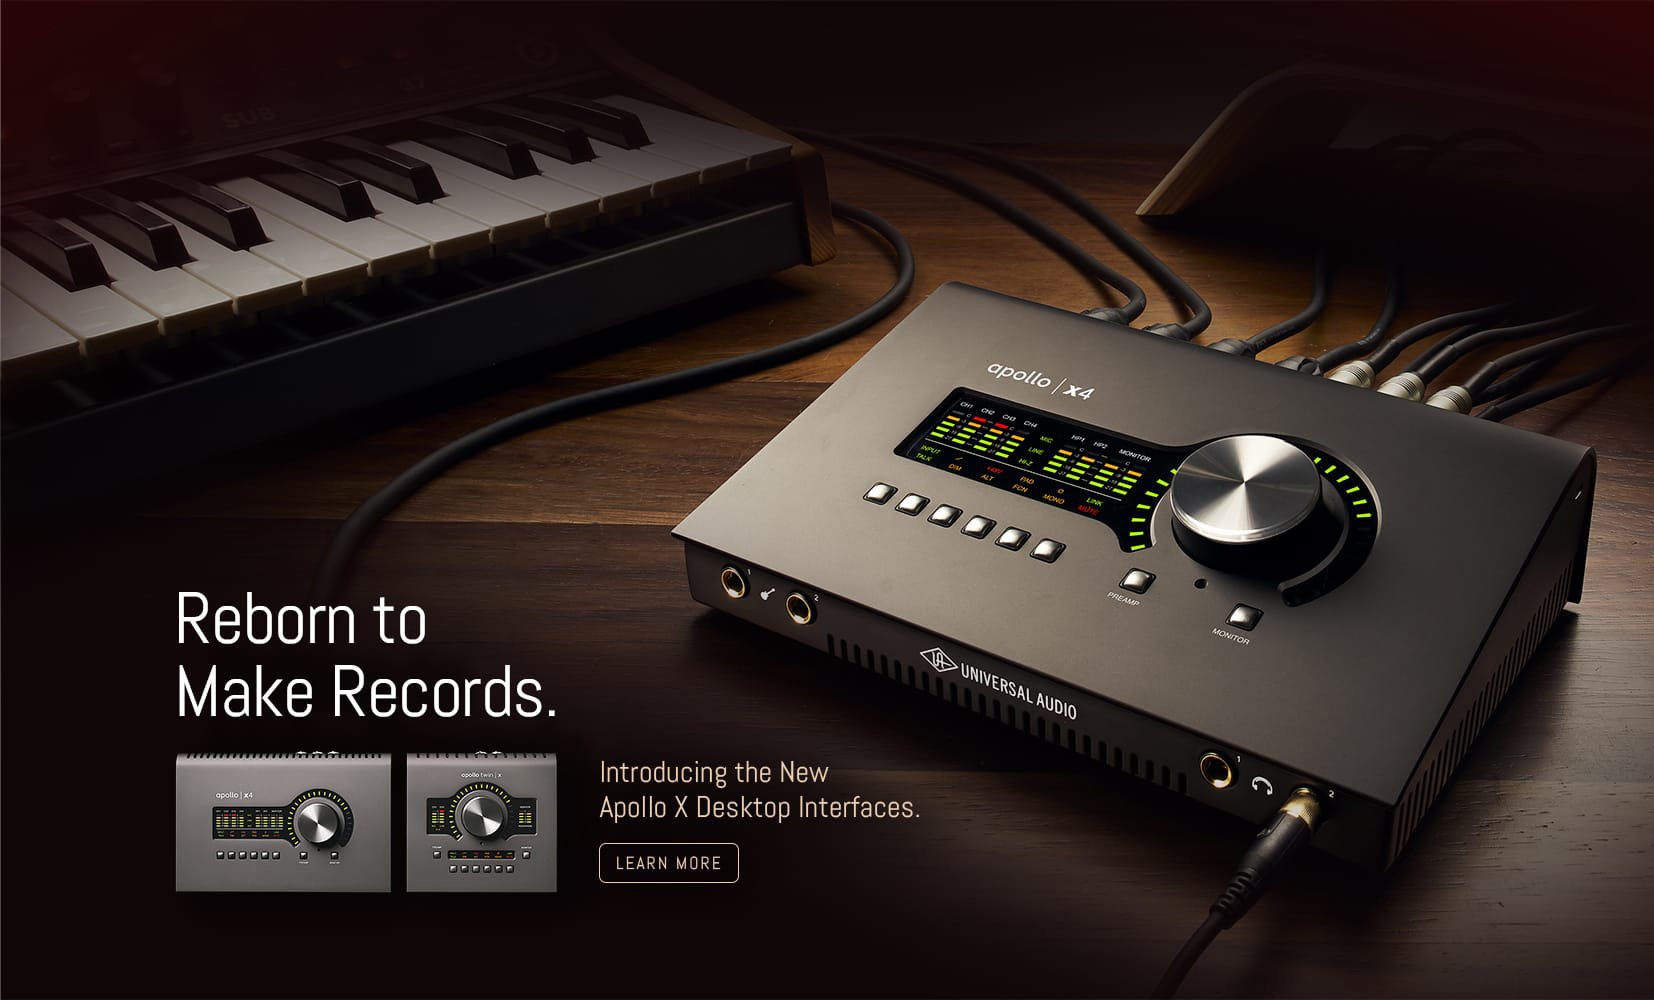 Universal Audio lanserar nya ljudkort – Apollo x4 och Apollo Twin X